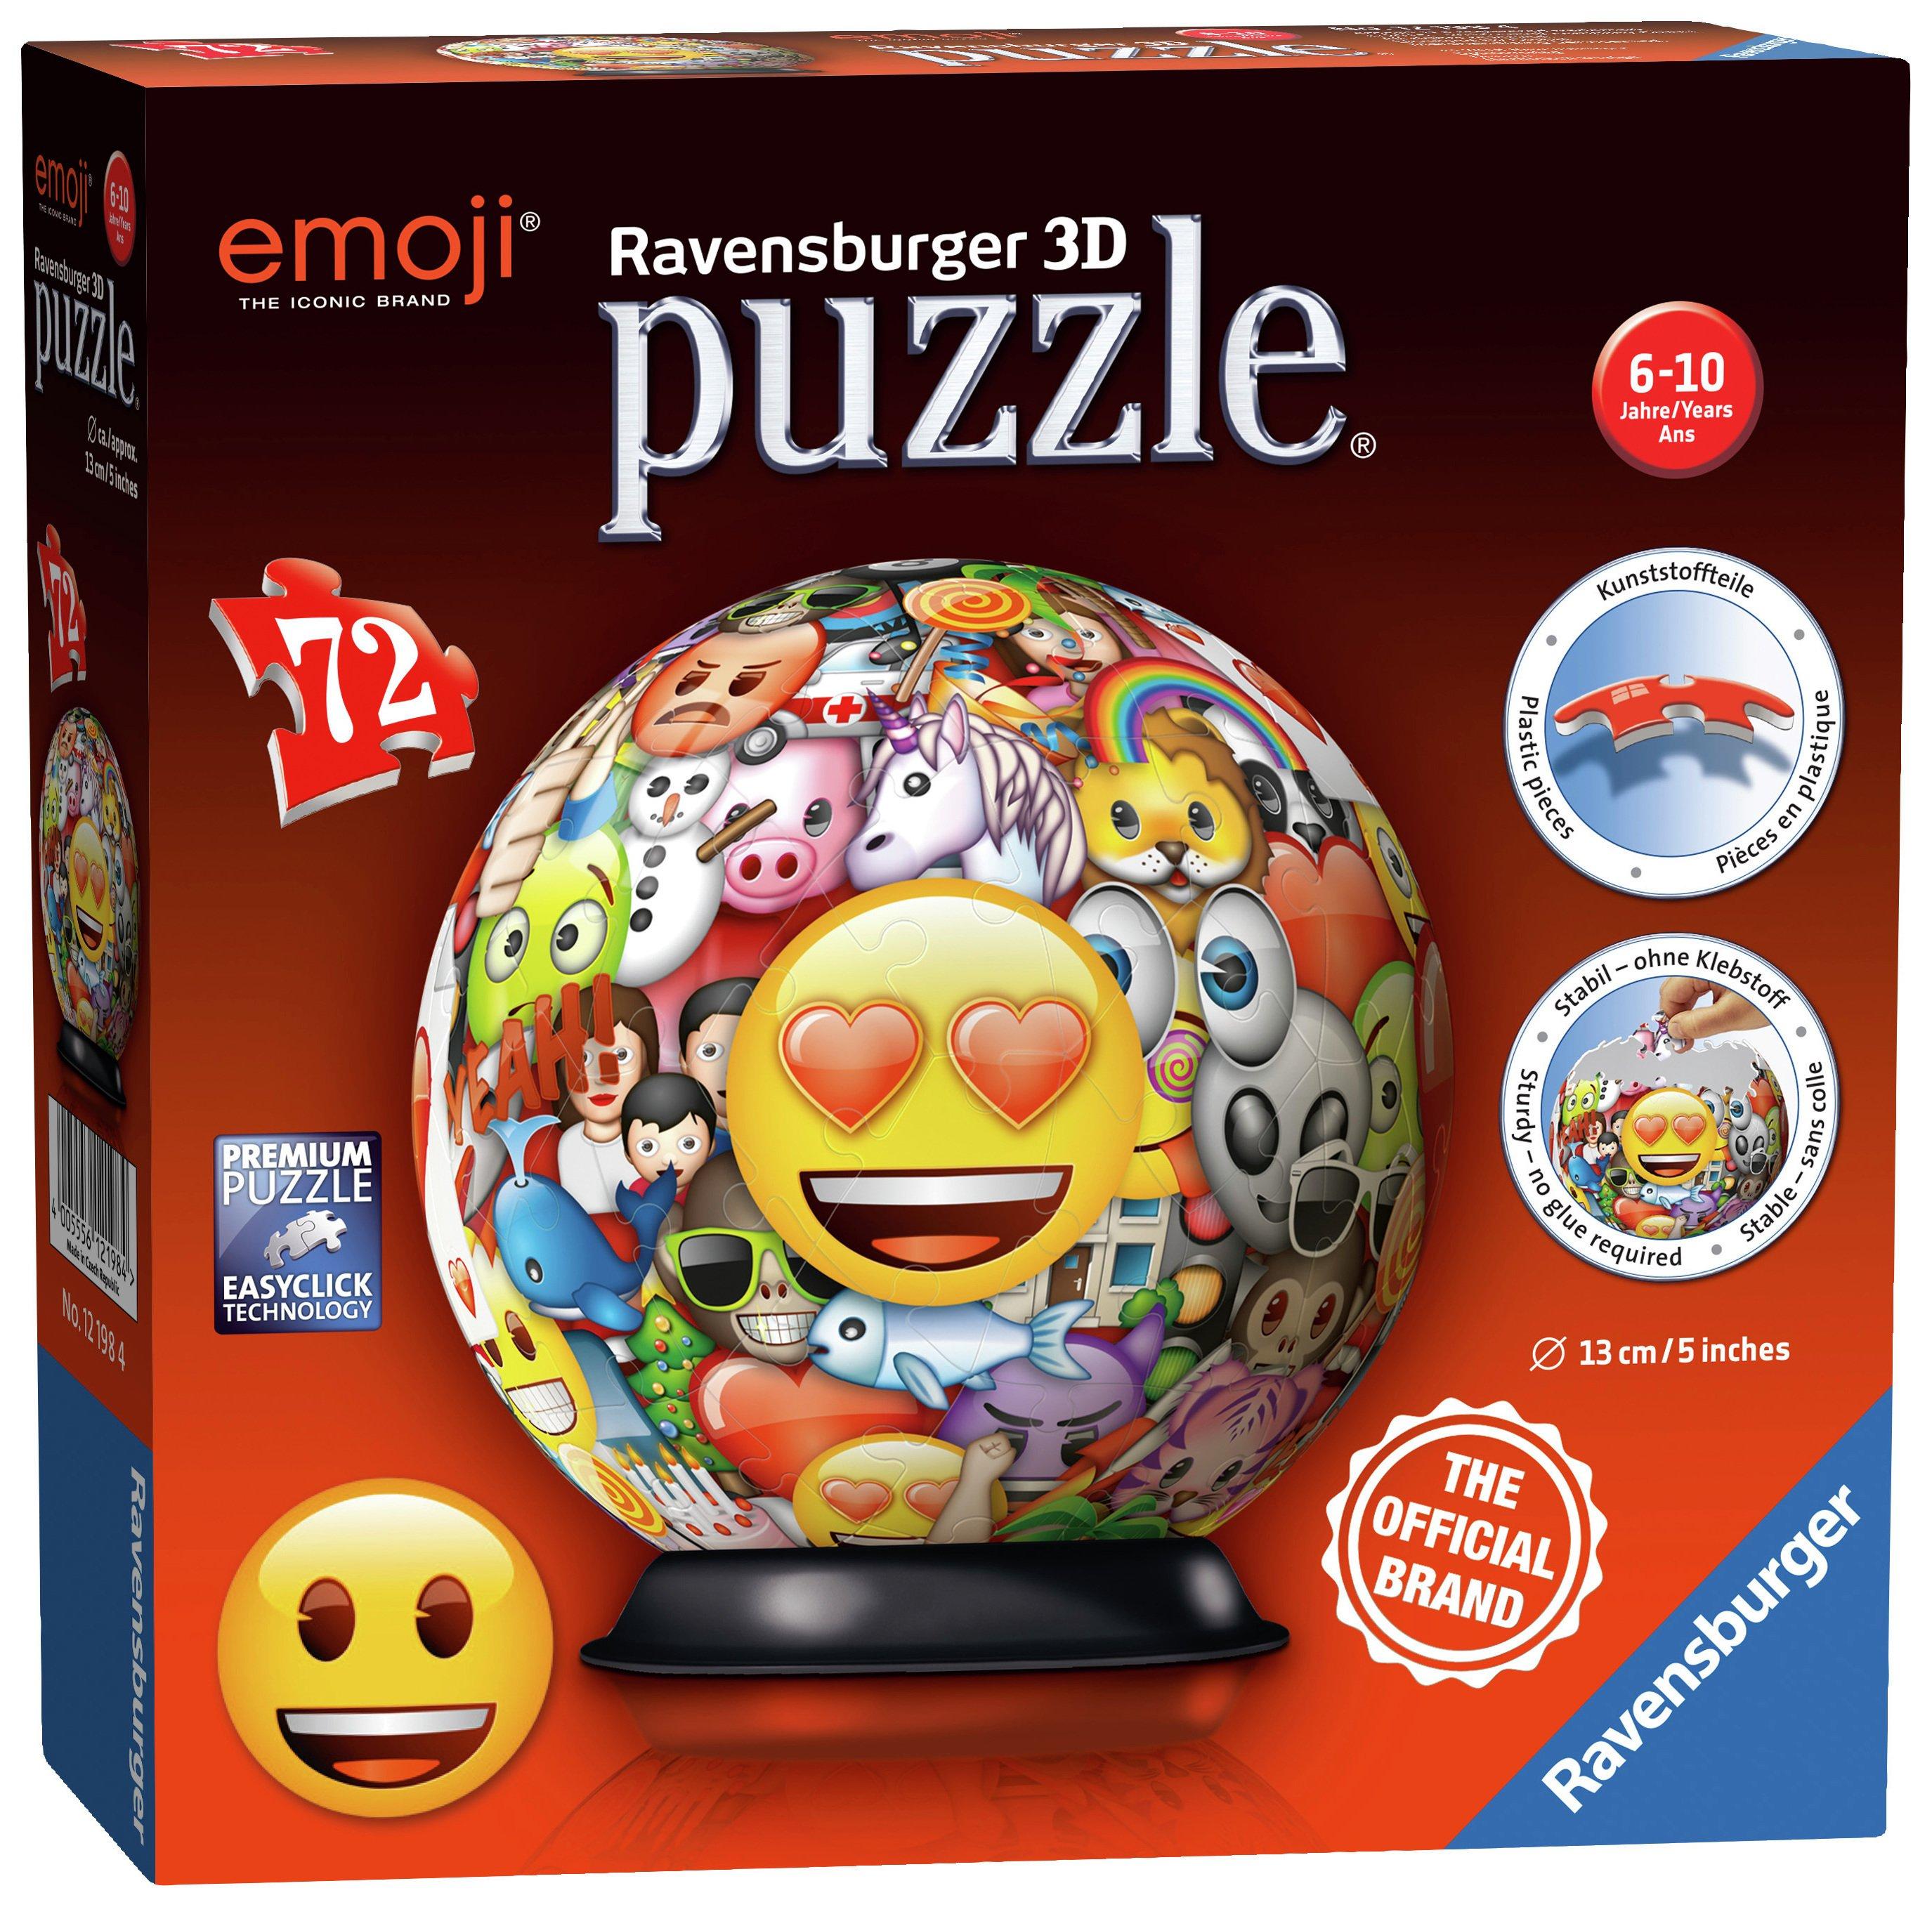 Image of Emoji 3D Puzzle 72 Pieces.